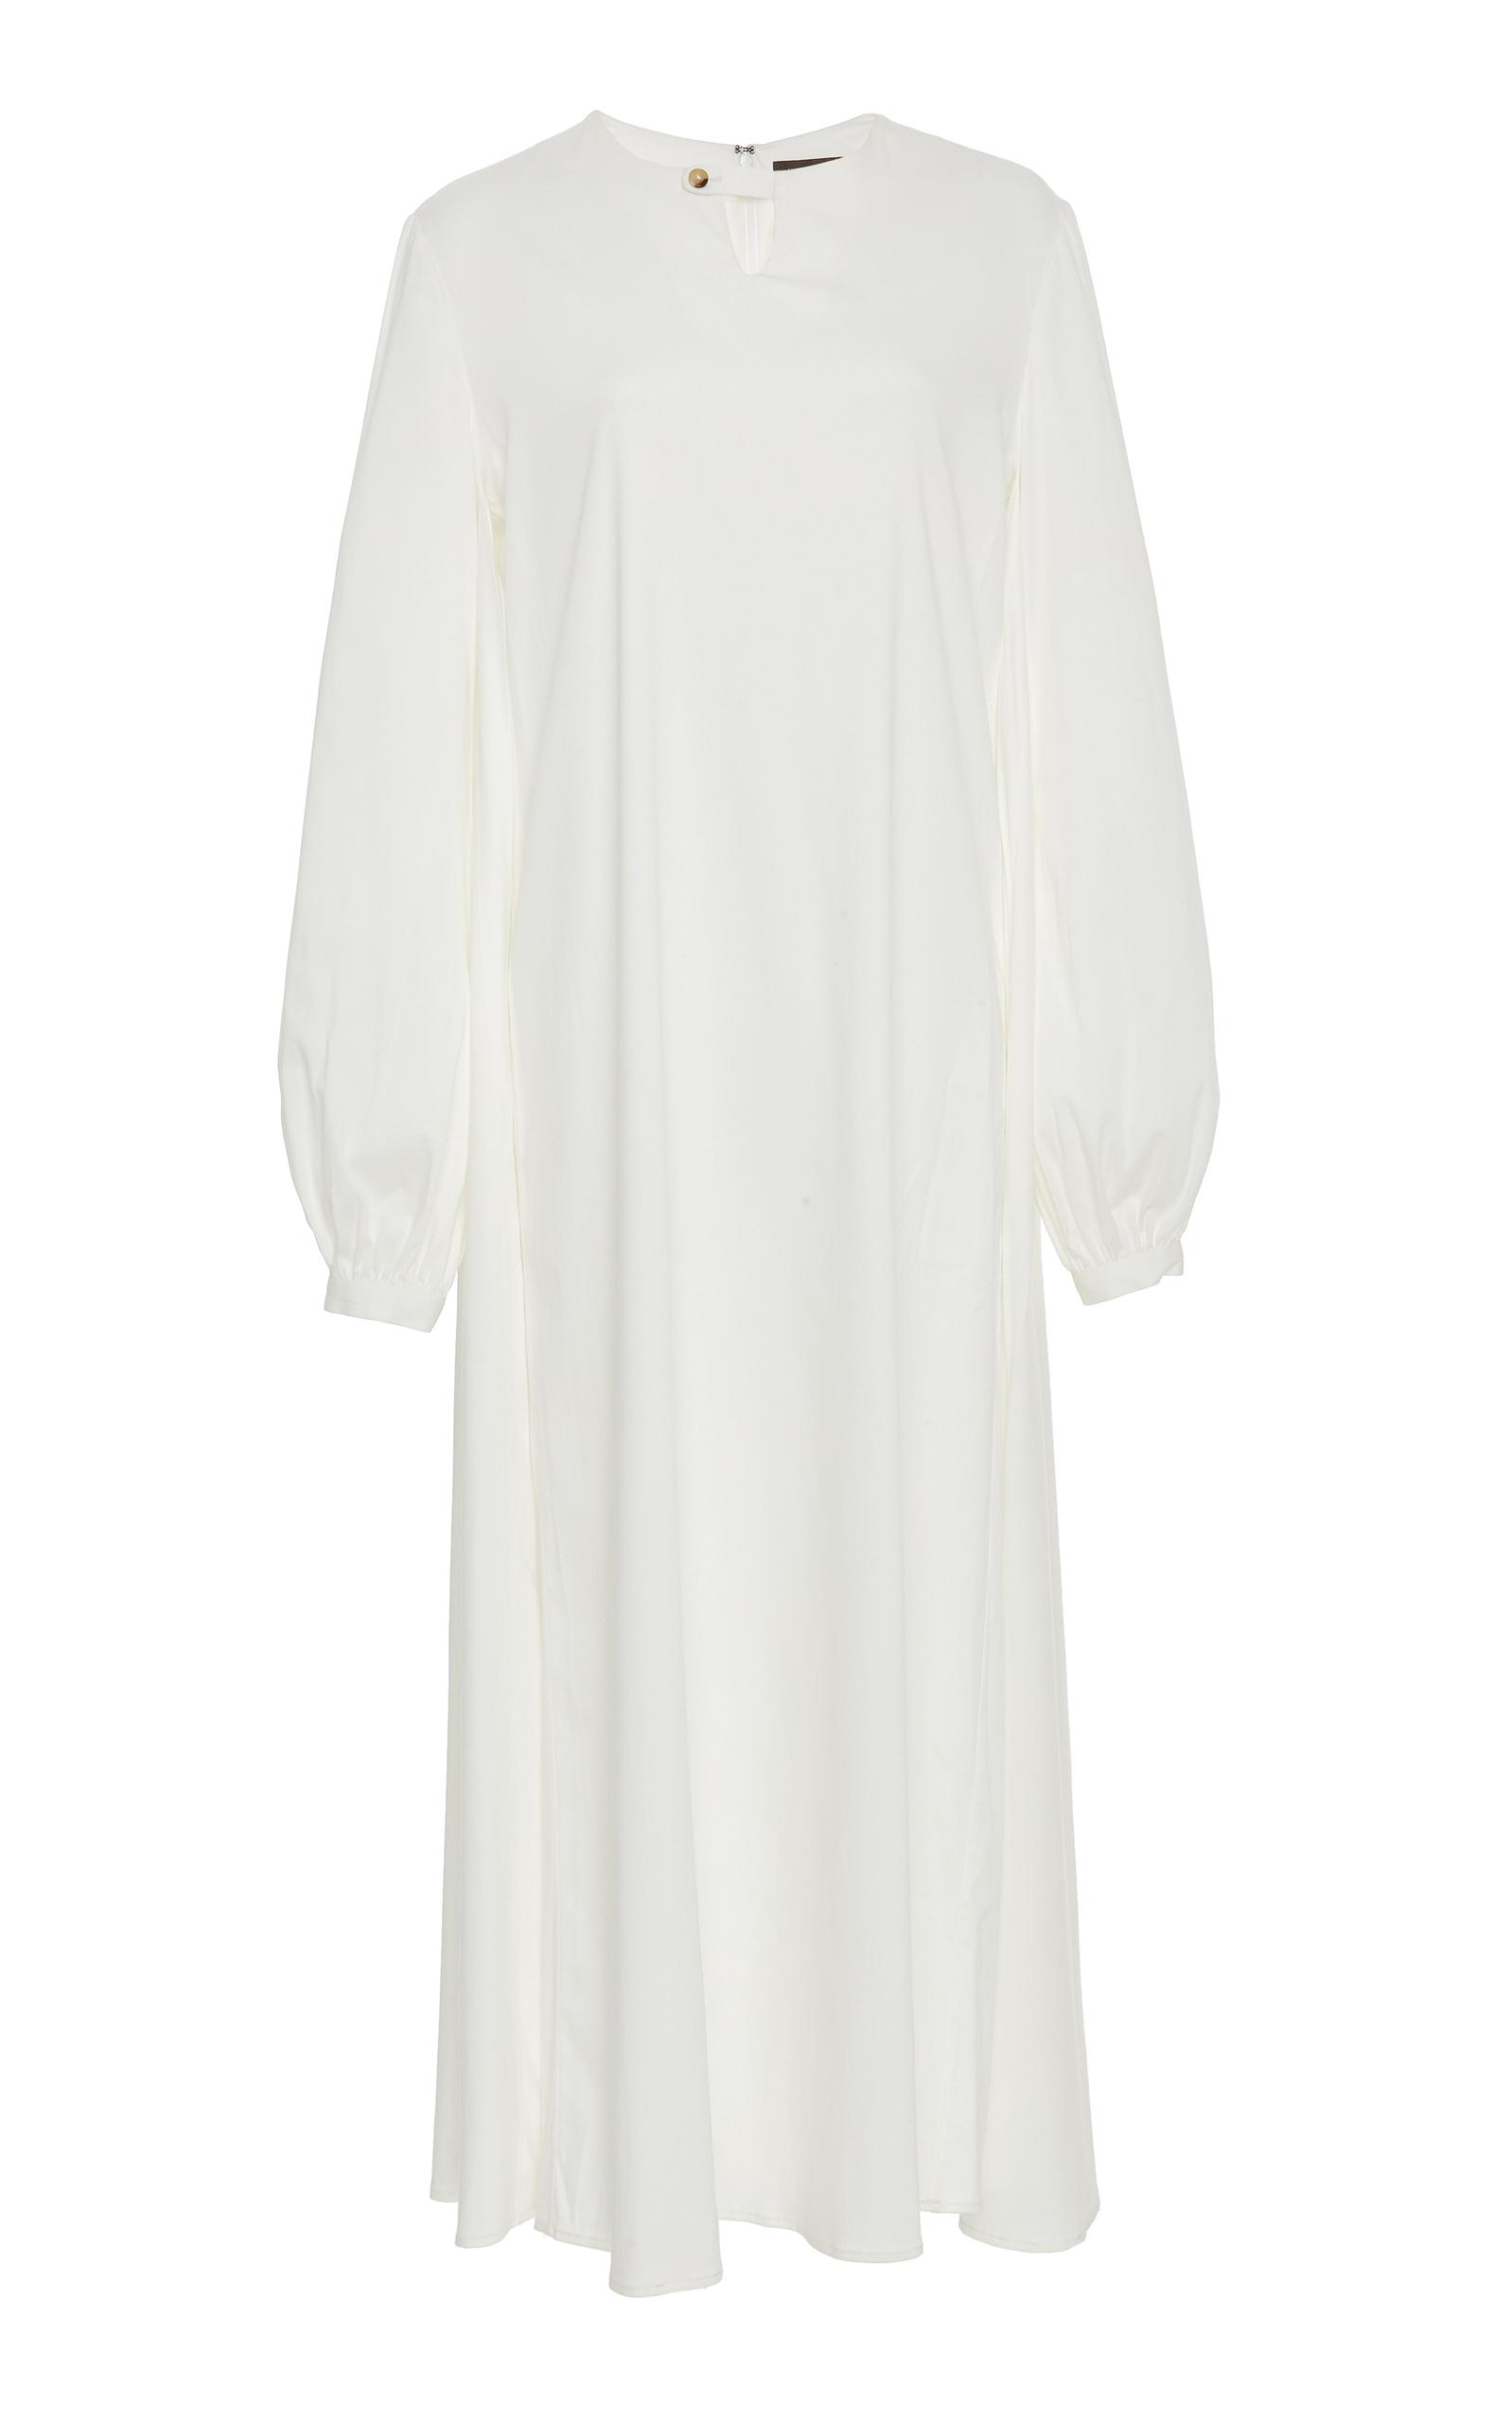 HENSELY Bishop Midi Dress in White